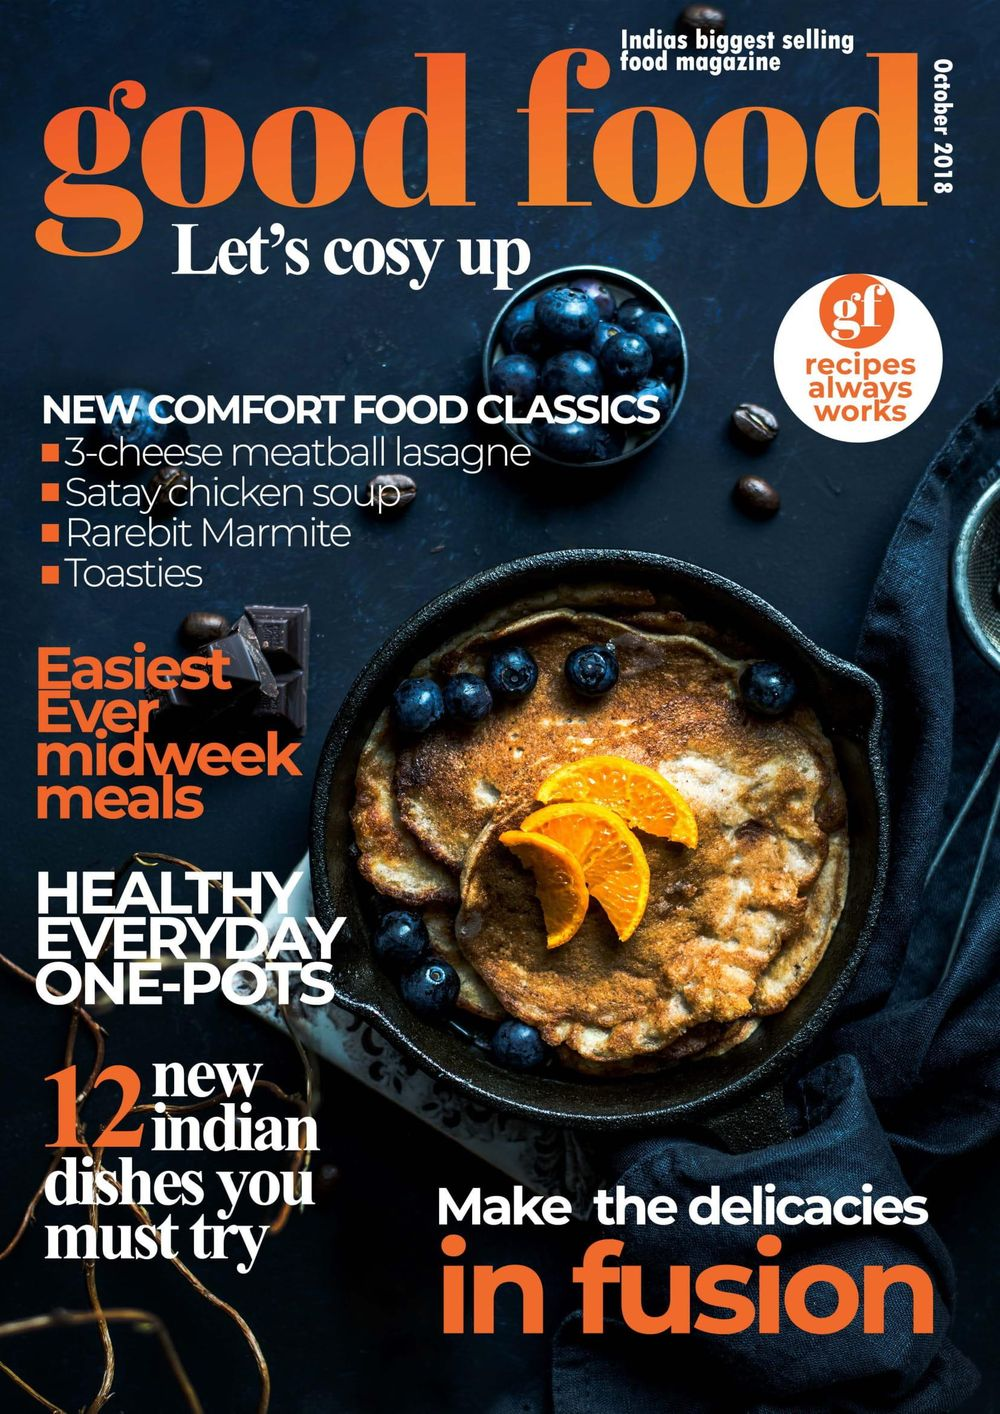 Food Magazine - image 1 - student project